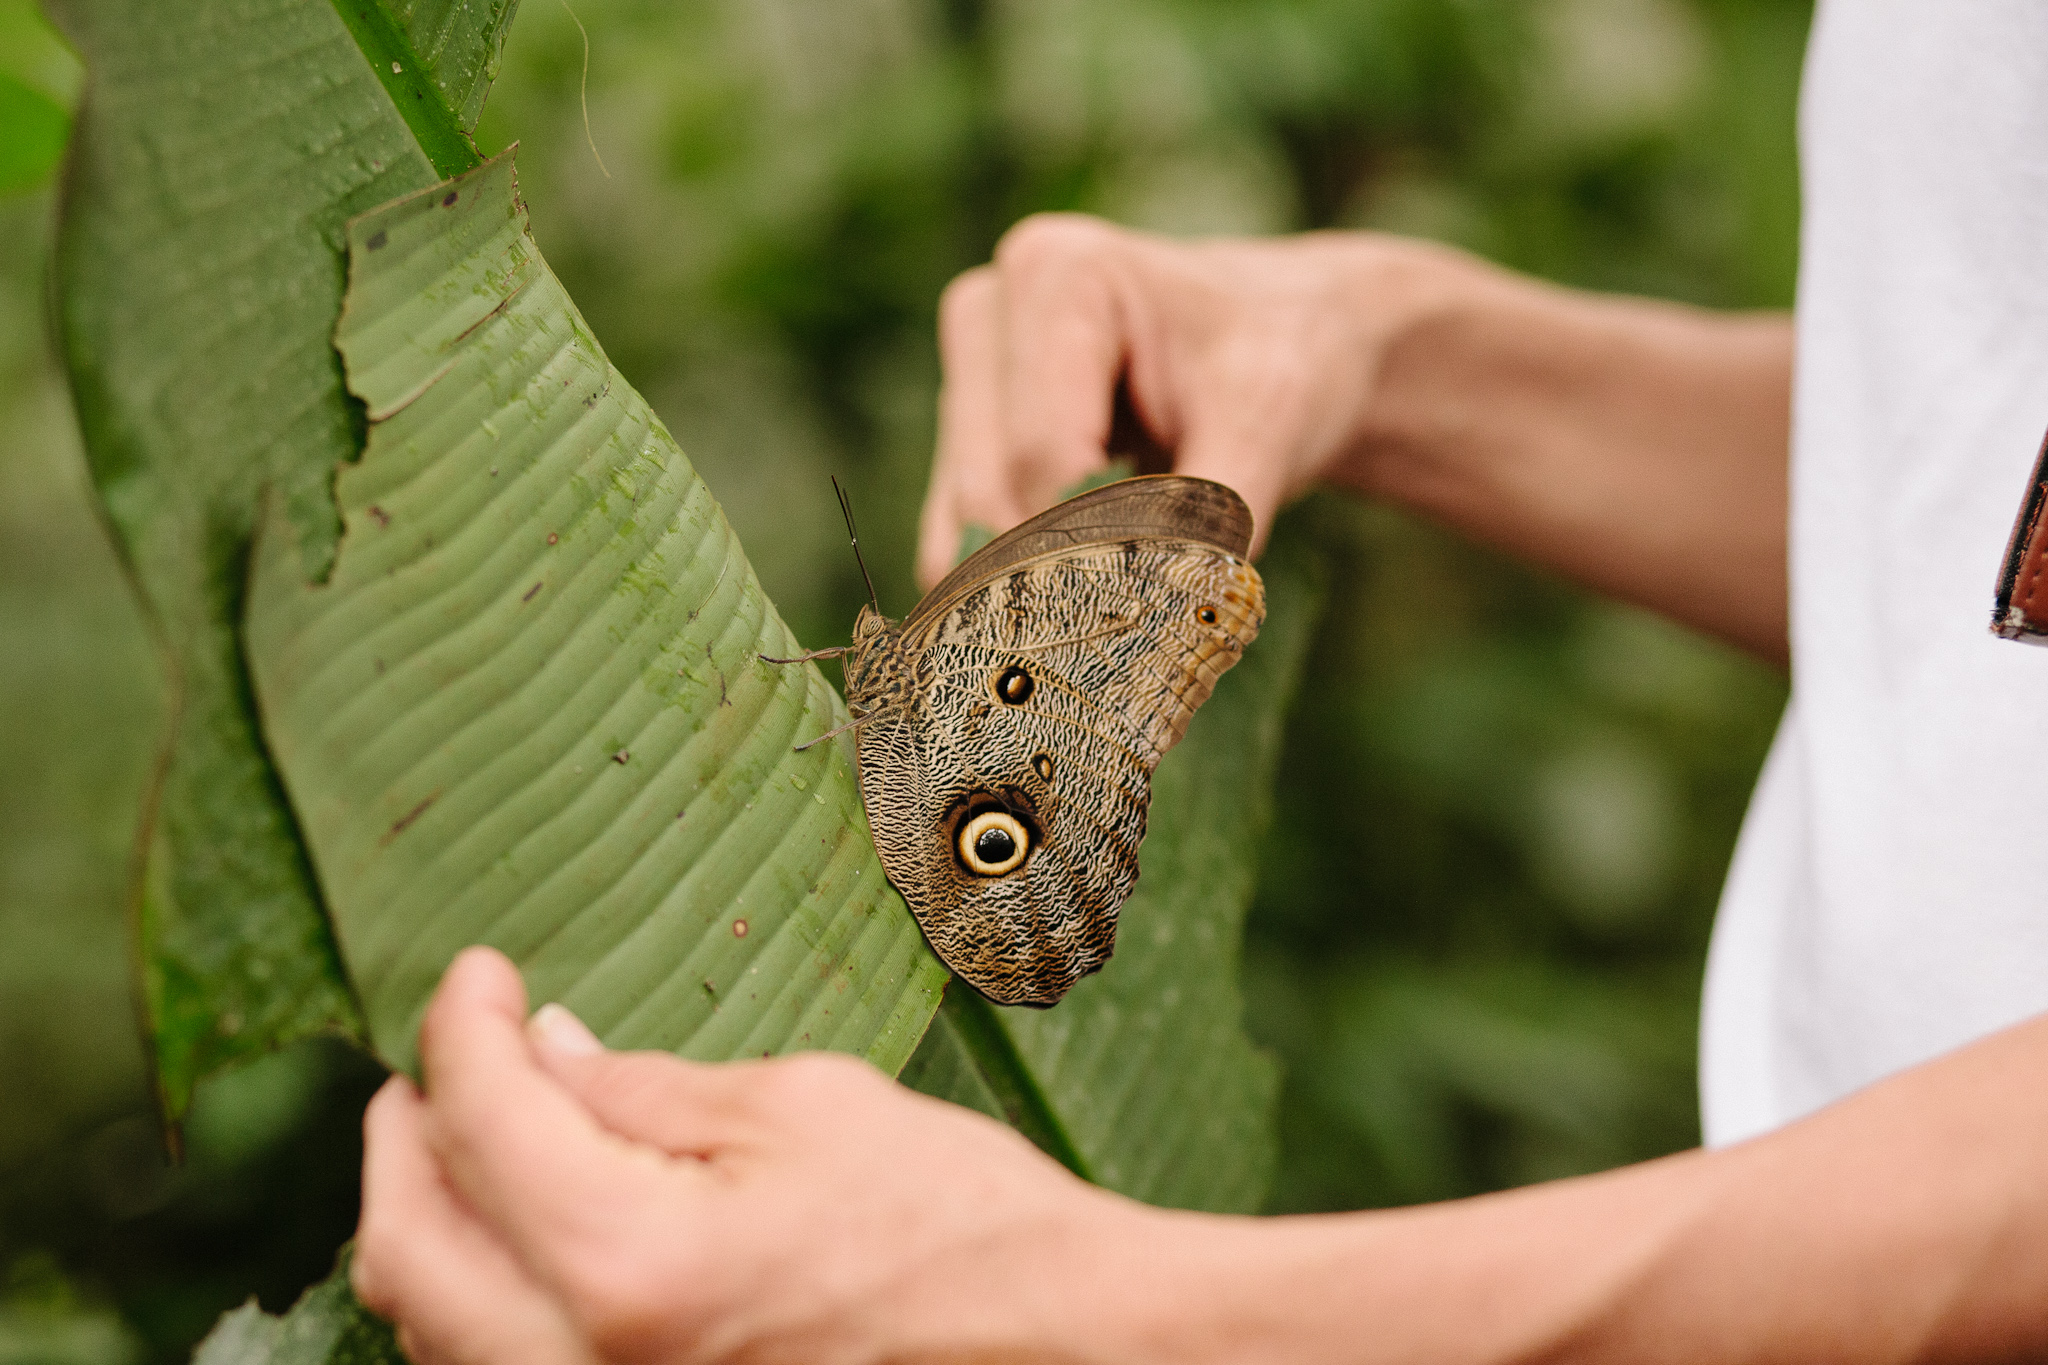 EcuadorQuito&Amazon_forwebsite2015_Jan2010_jenniferleahy-044.jpg